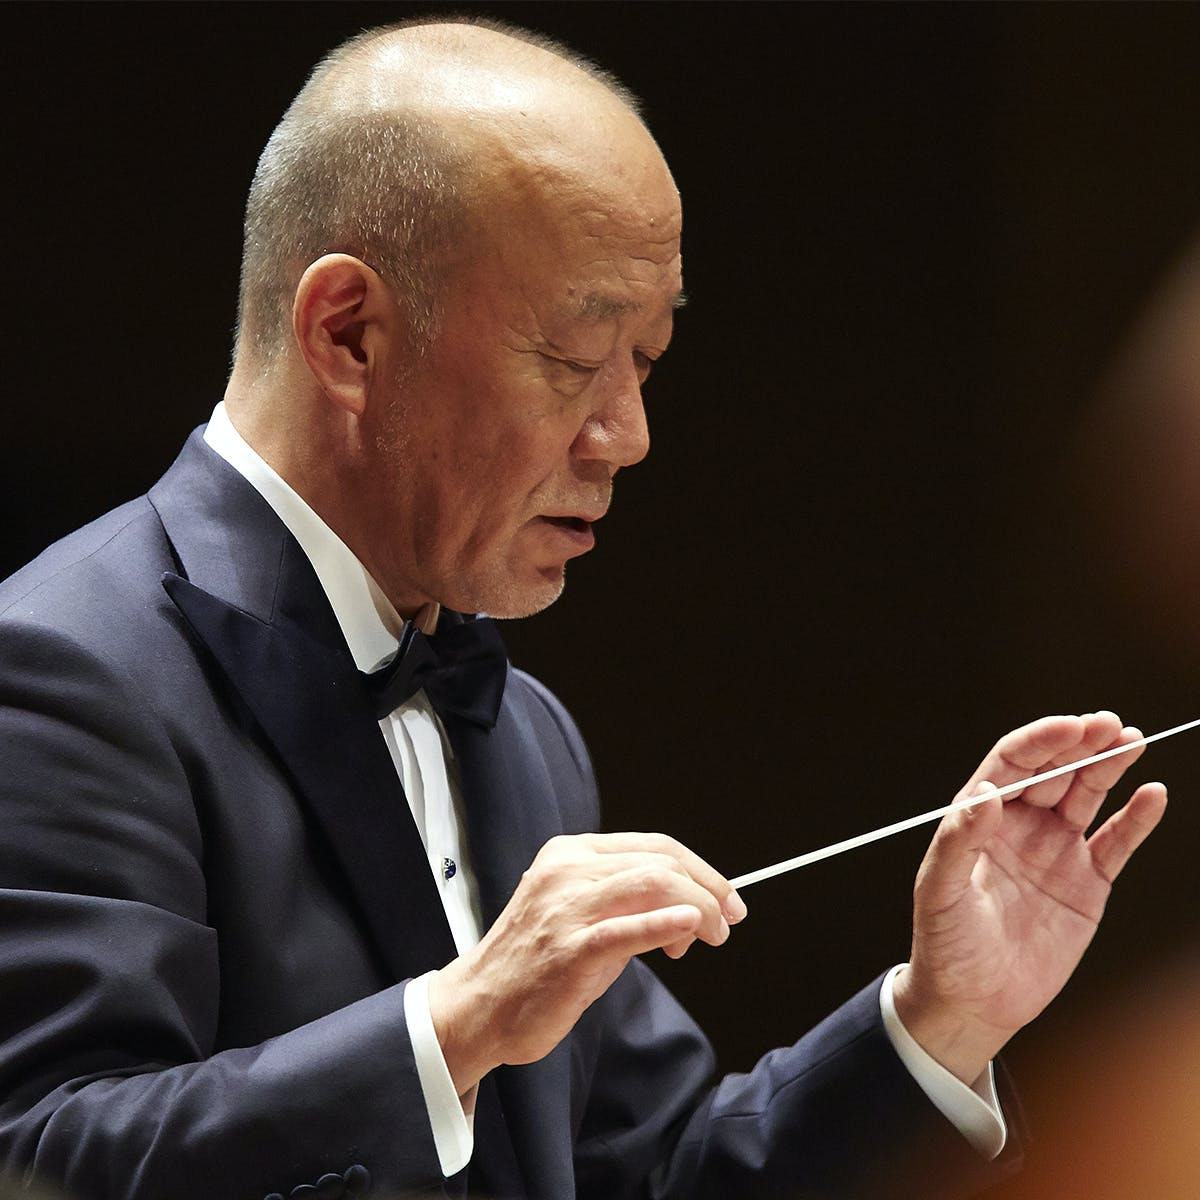 Music from the Studio Ghibli Films of Hayao Miyazaki, at Carnegie Hall